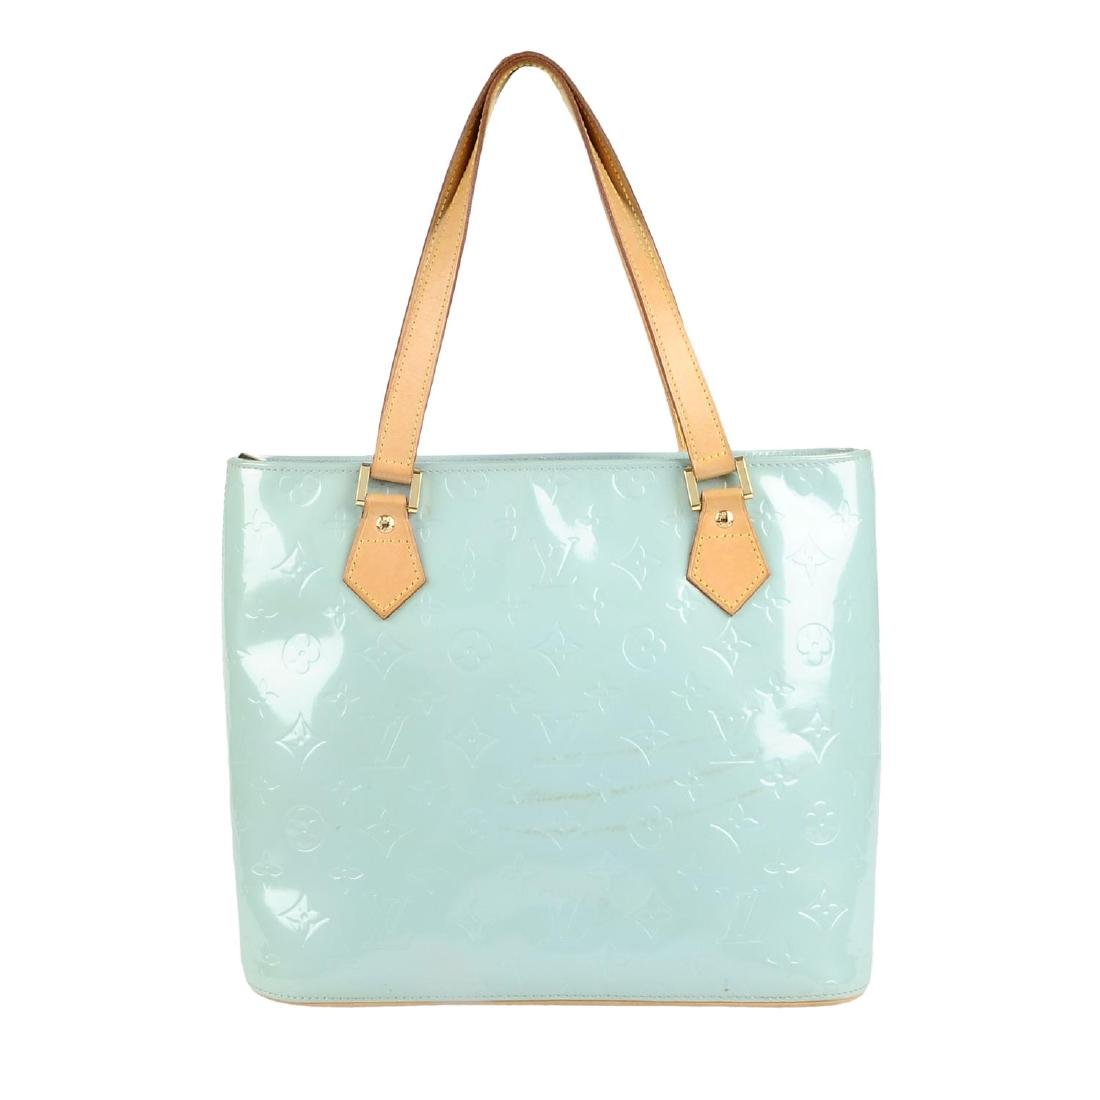 LOUIS VUITTON - a blue Vernis Houston handbag.